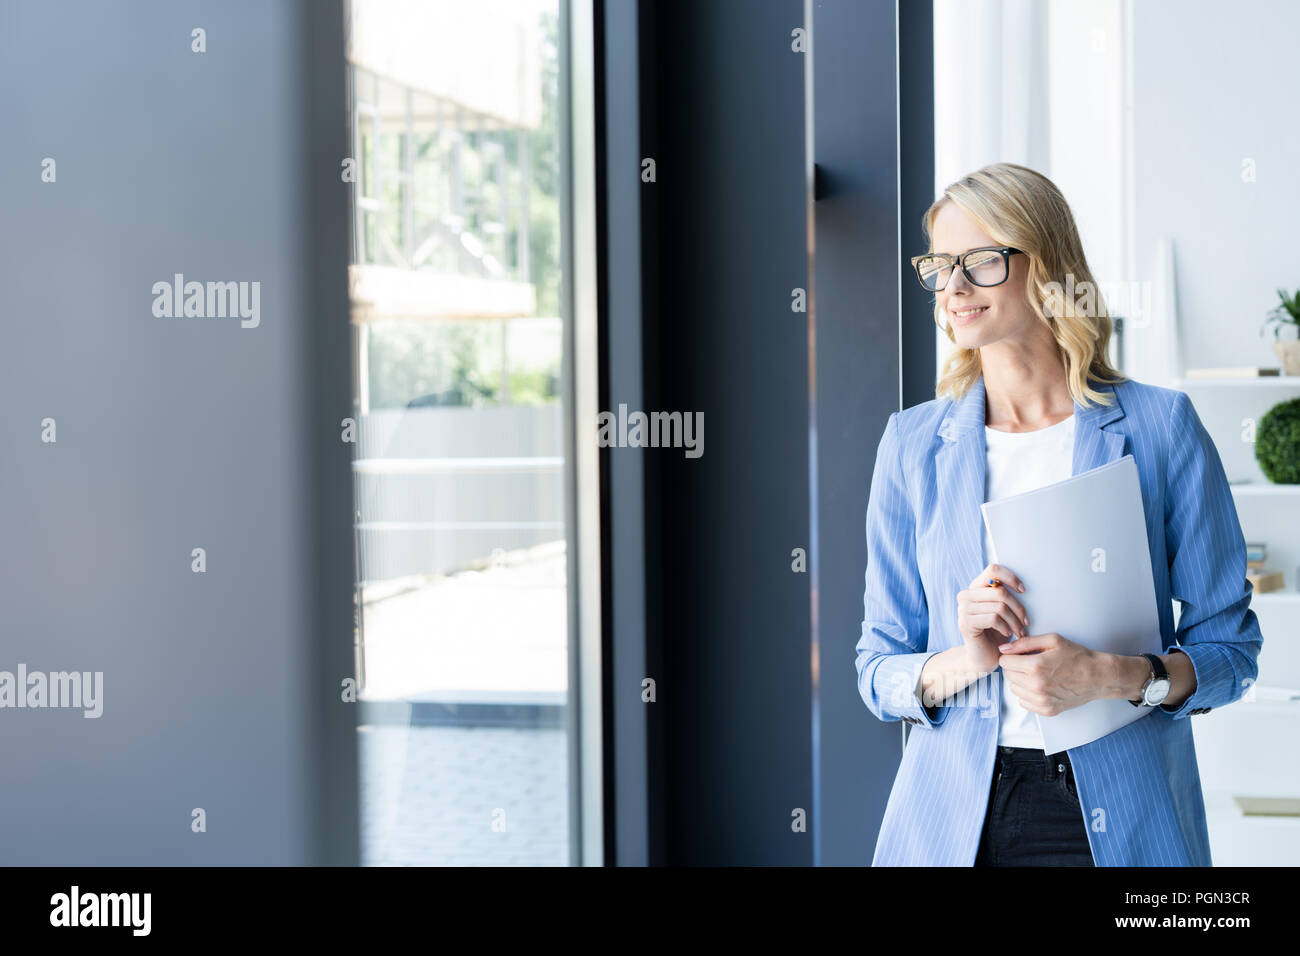 Moderne Business-Frau im Büro mit Textfreiraum. Stockbild